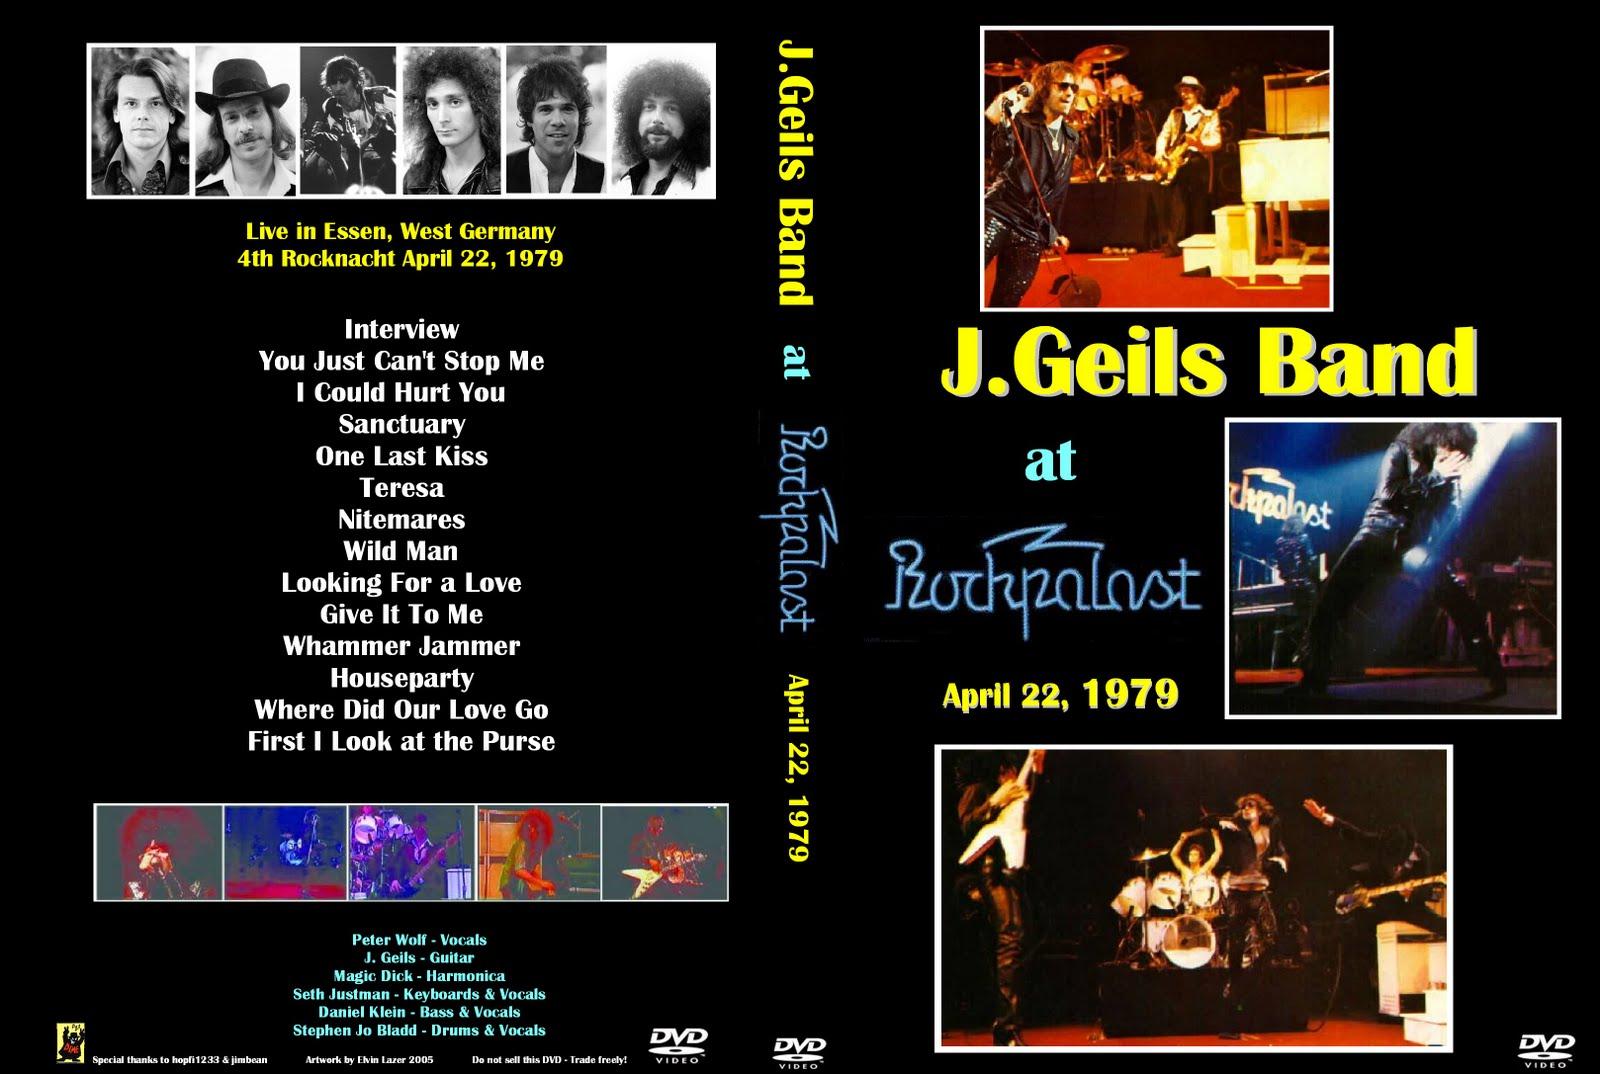 http://2.bp.blogspot.com/-Skl159Z7JUo/T7skD4ZG_ZI/AAAAAAAAEgE/Z-cTK9uJfHg/s1600/DVD+-+JGeilsBandRockpalastDVDcover.jpeg